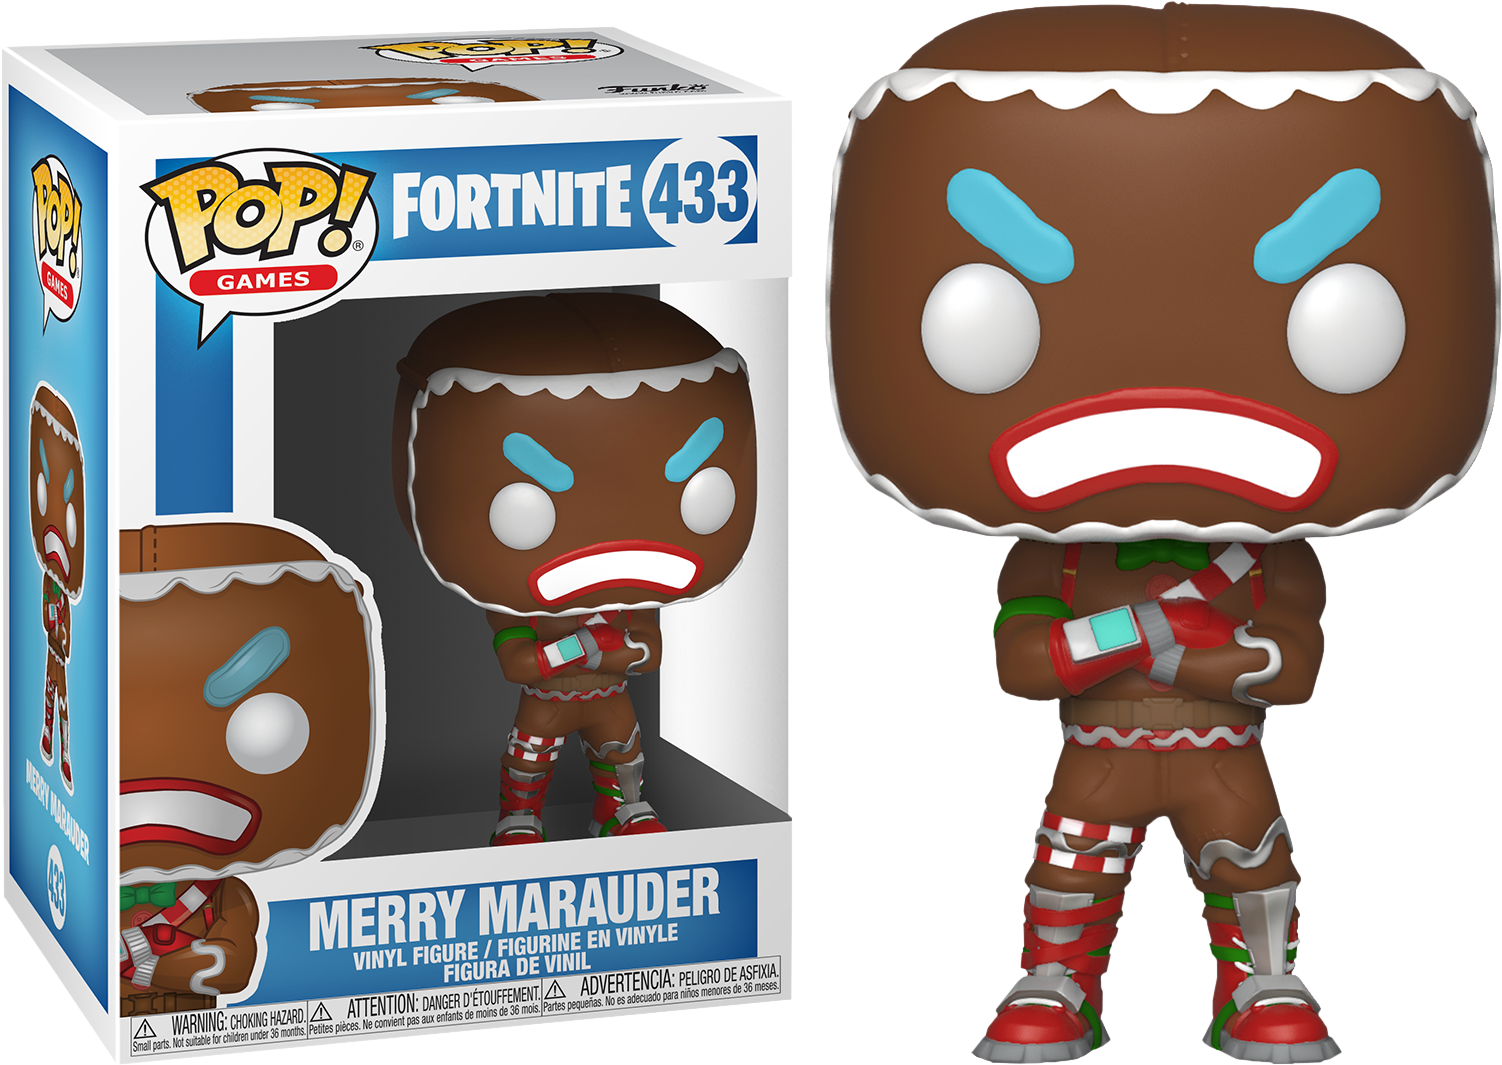 fortnite battle royale characters png merry marauder funko pop 1530x1100 png download - fortnite character png hd